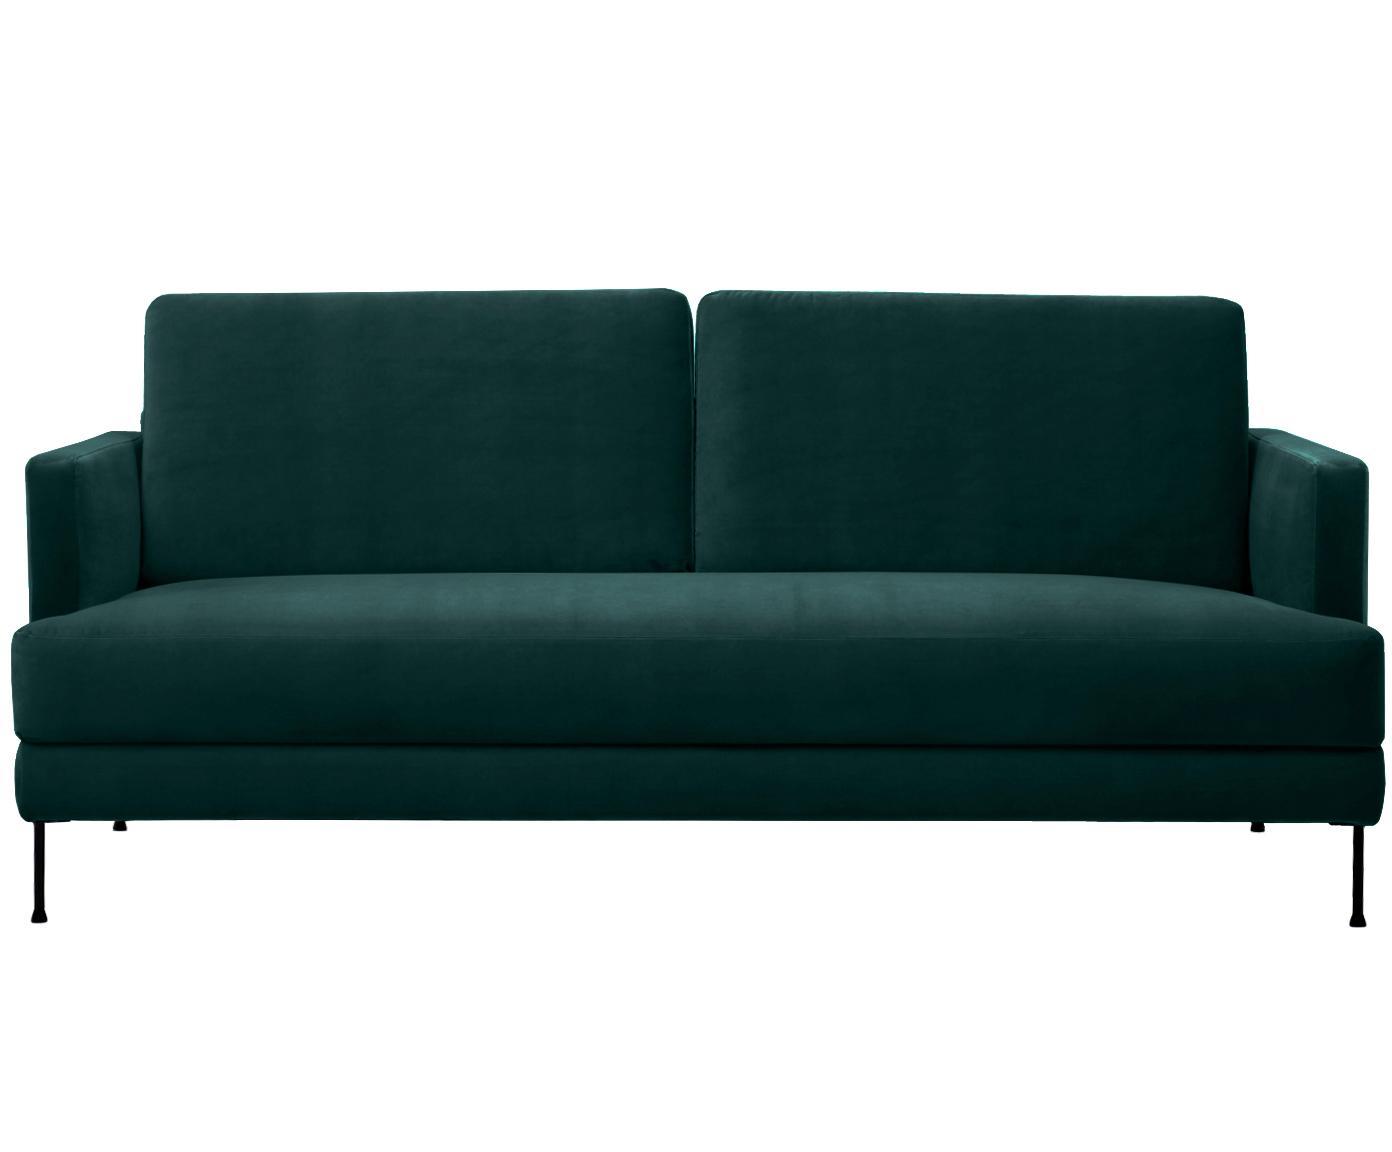 Fluwelen bank Fluente (3-zits), Bekleding: fluweel (hoogwaardig poly, Frame: massief grenenhout, Poten: gelakt metaal, Donkergroen, B 197 x D 83 cm